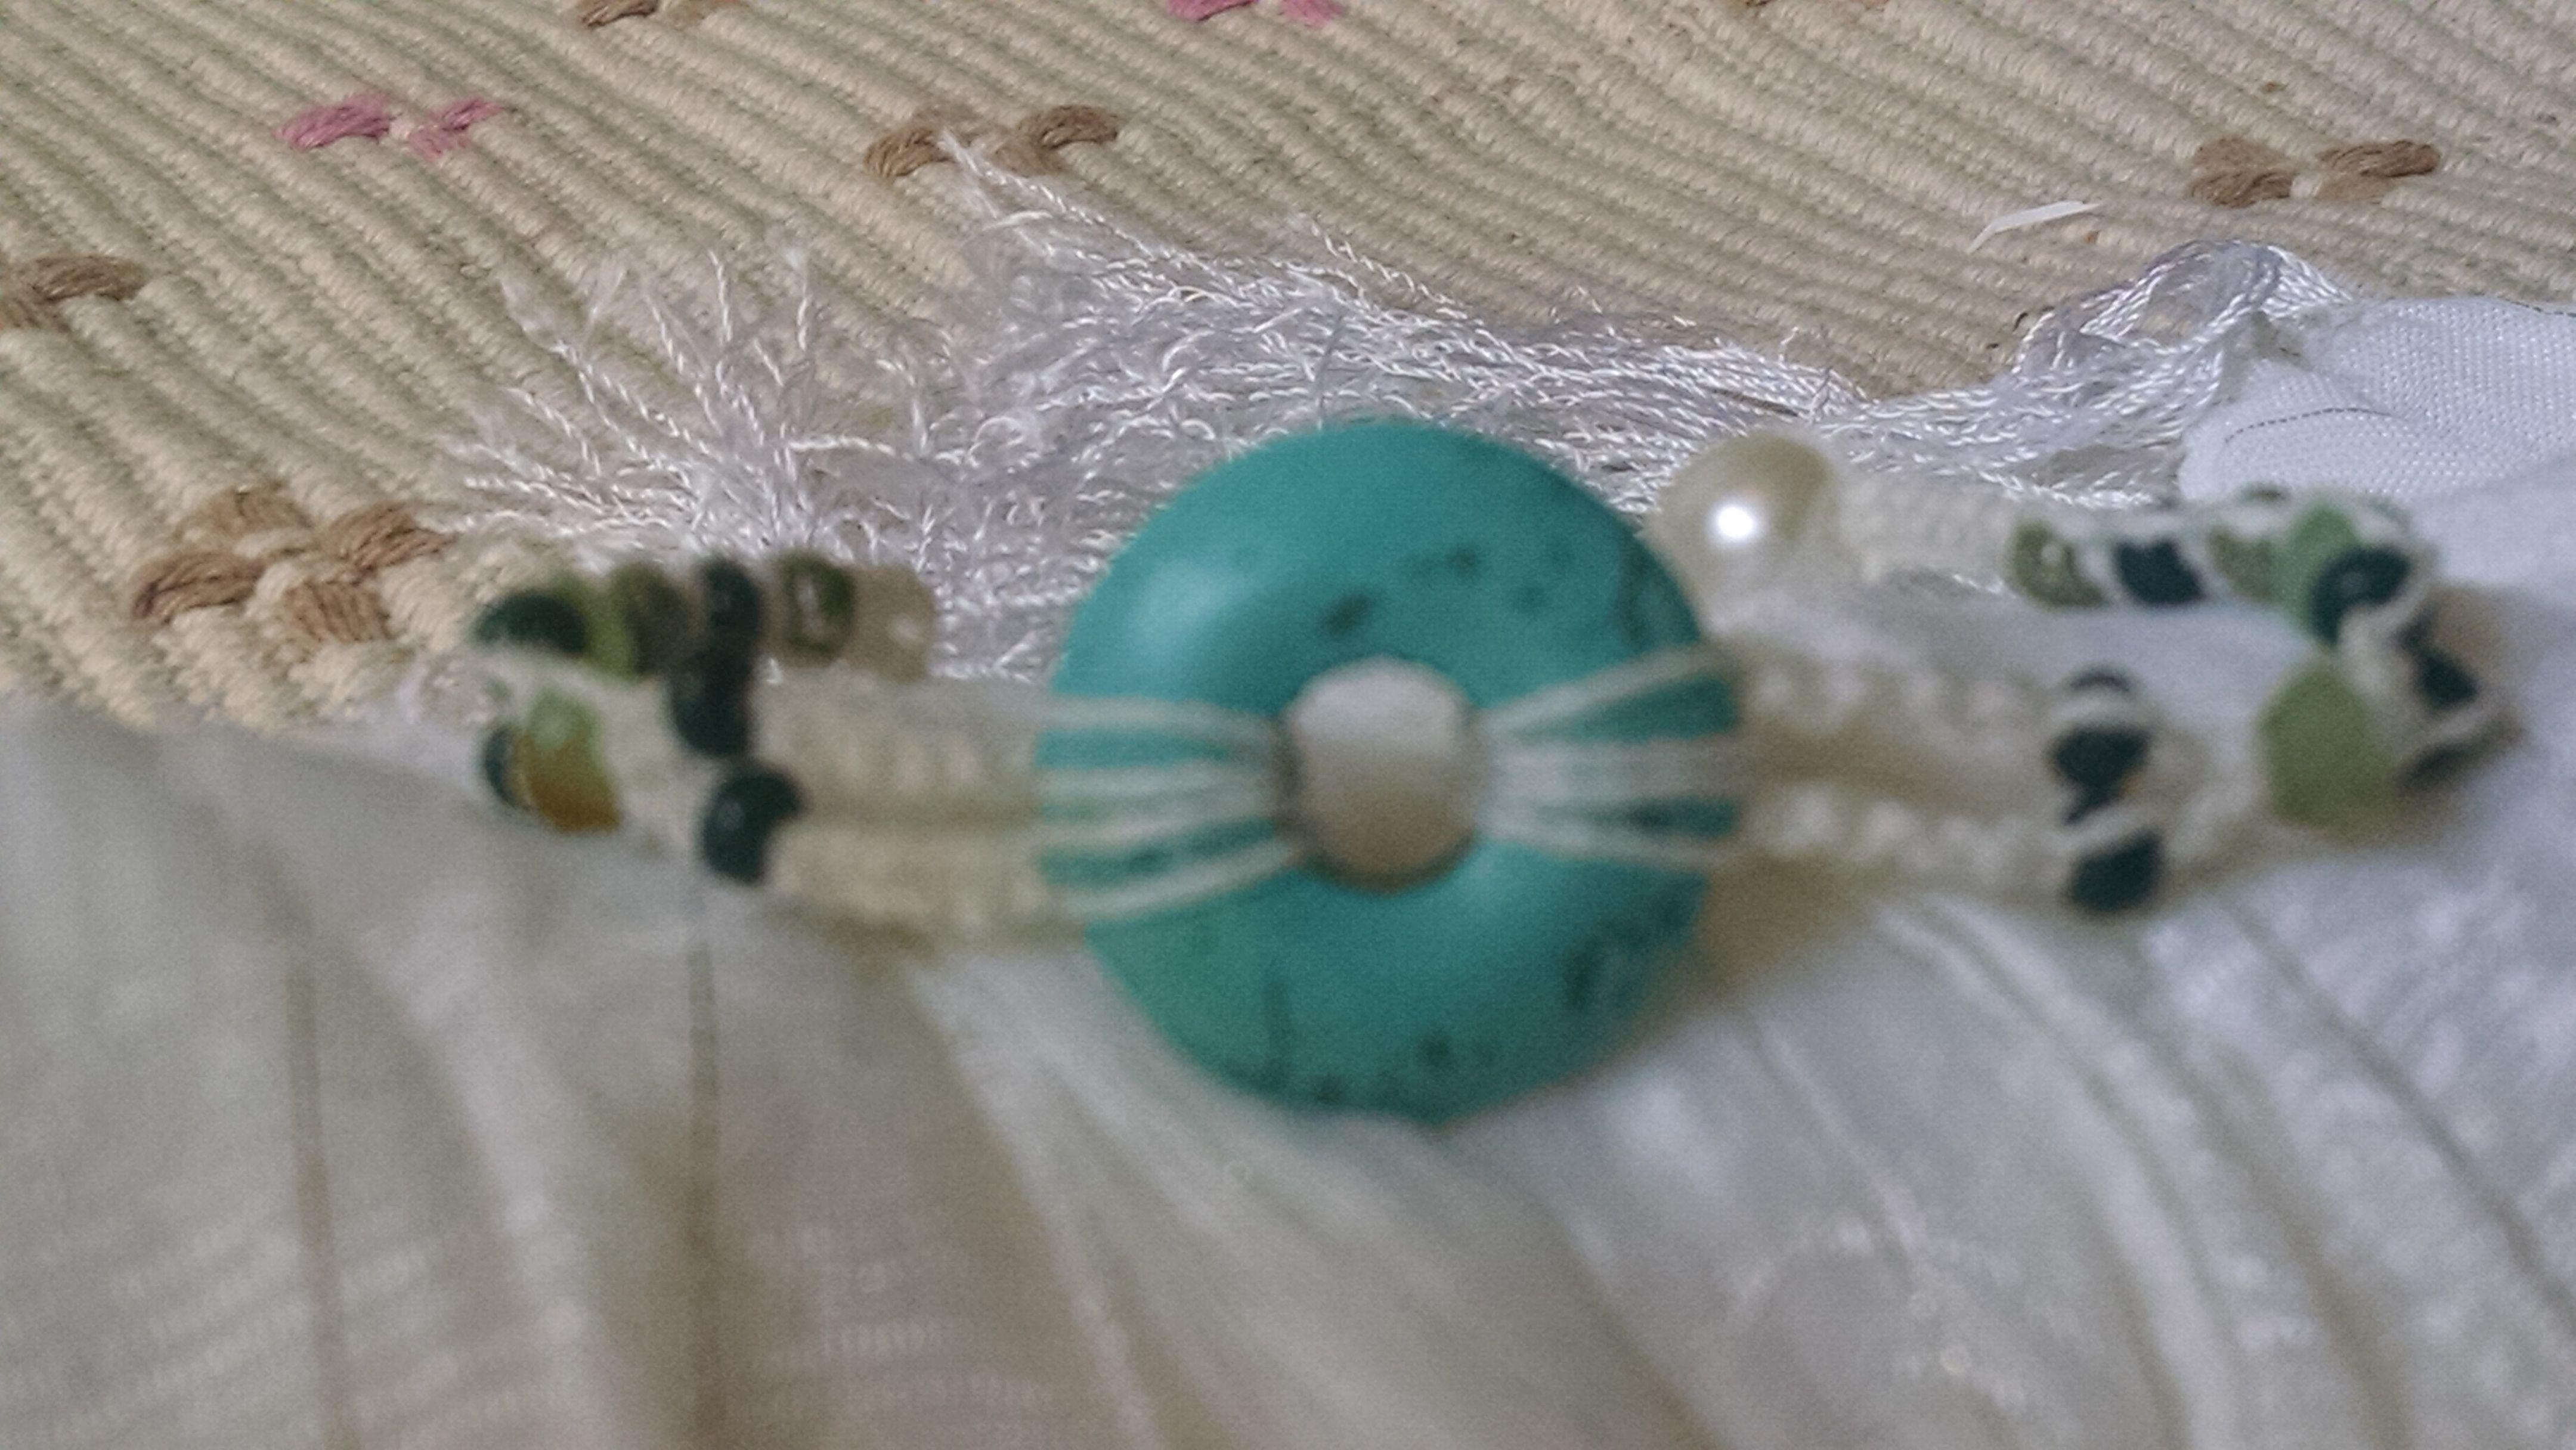 pulseira macrame branco com pedra azul turquesa